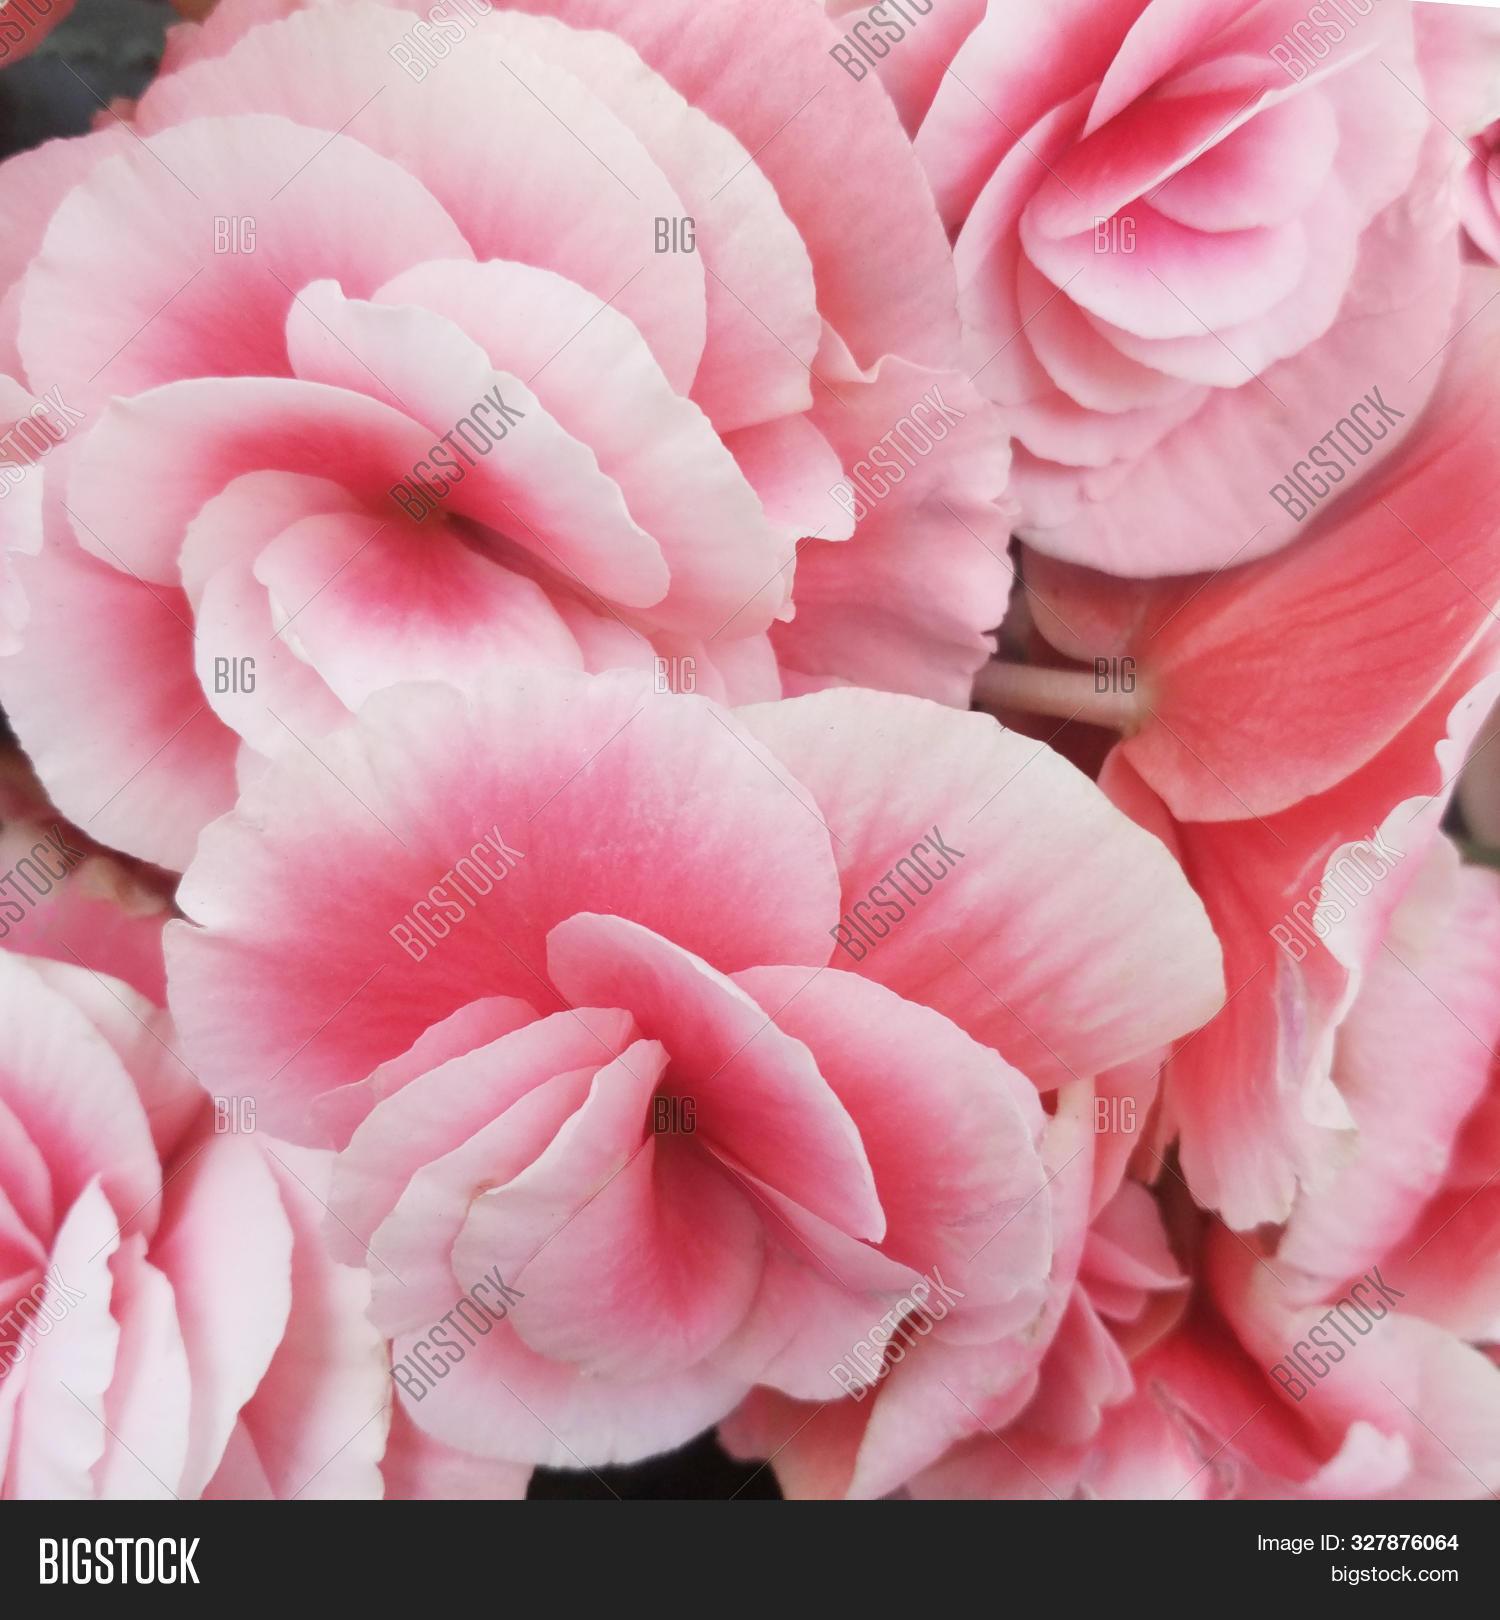 Beautiful Wallpaper Image Photo Free Trial Bigstock